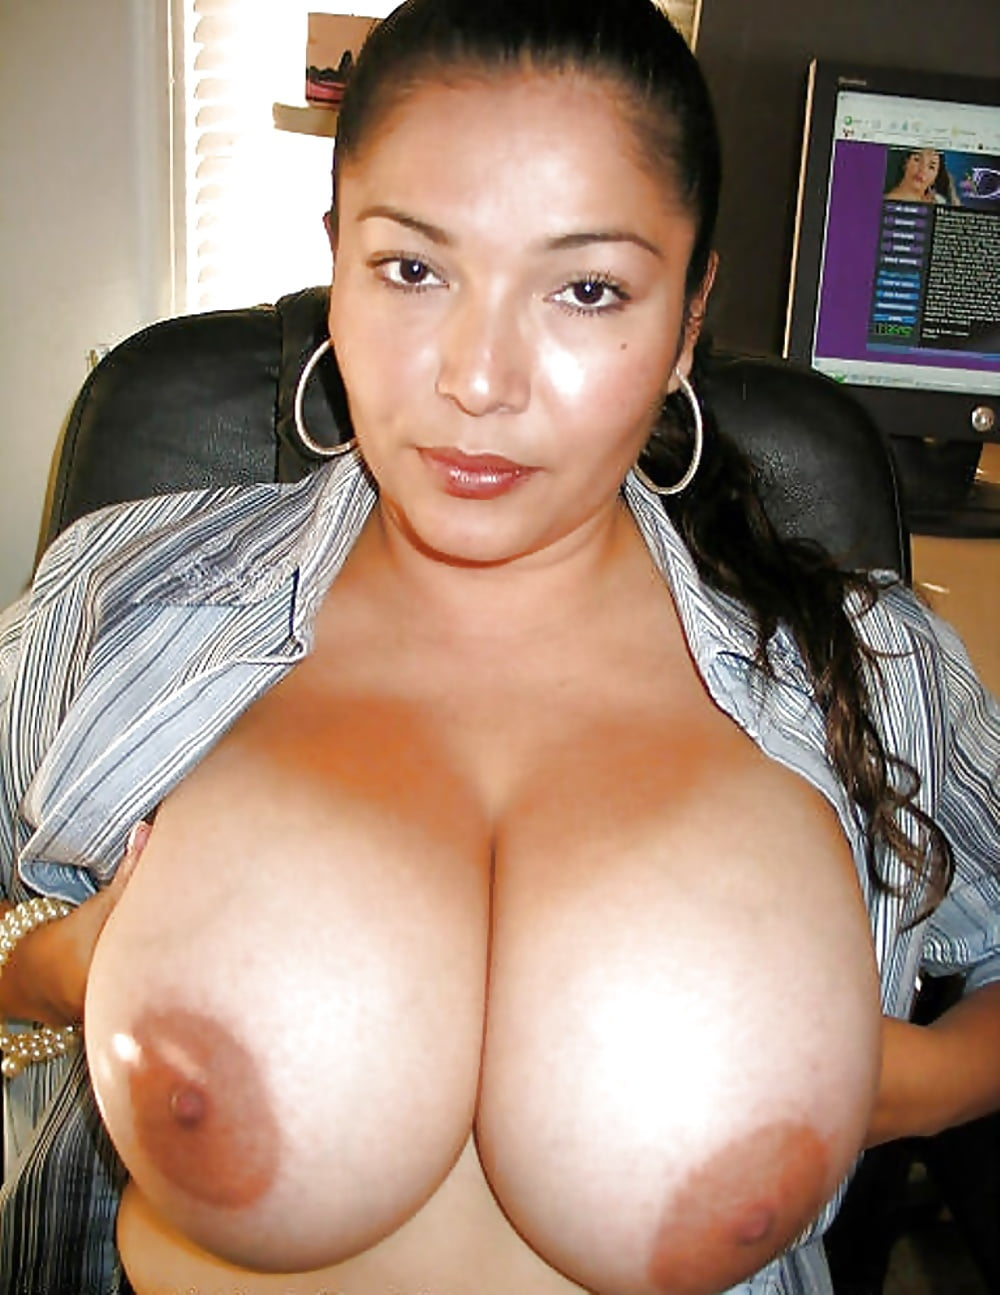 Sophia Latina Hispanic Porn Hot Stolen Private Pics